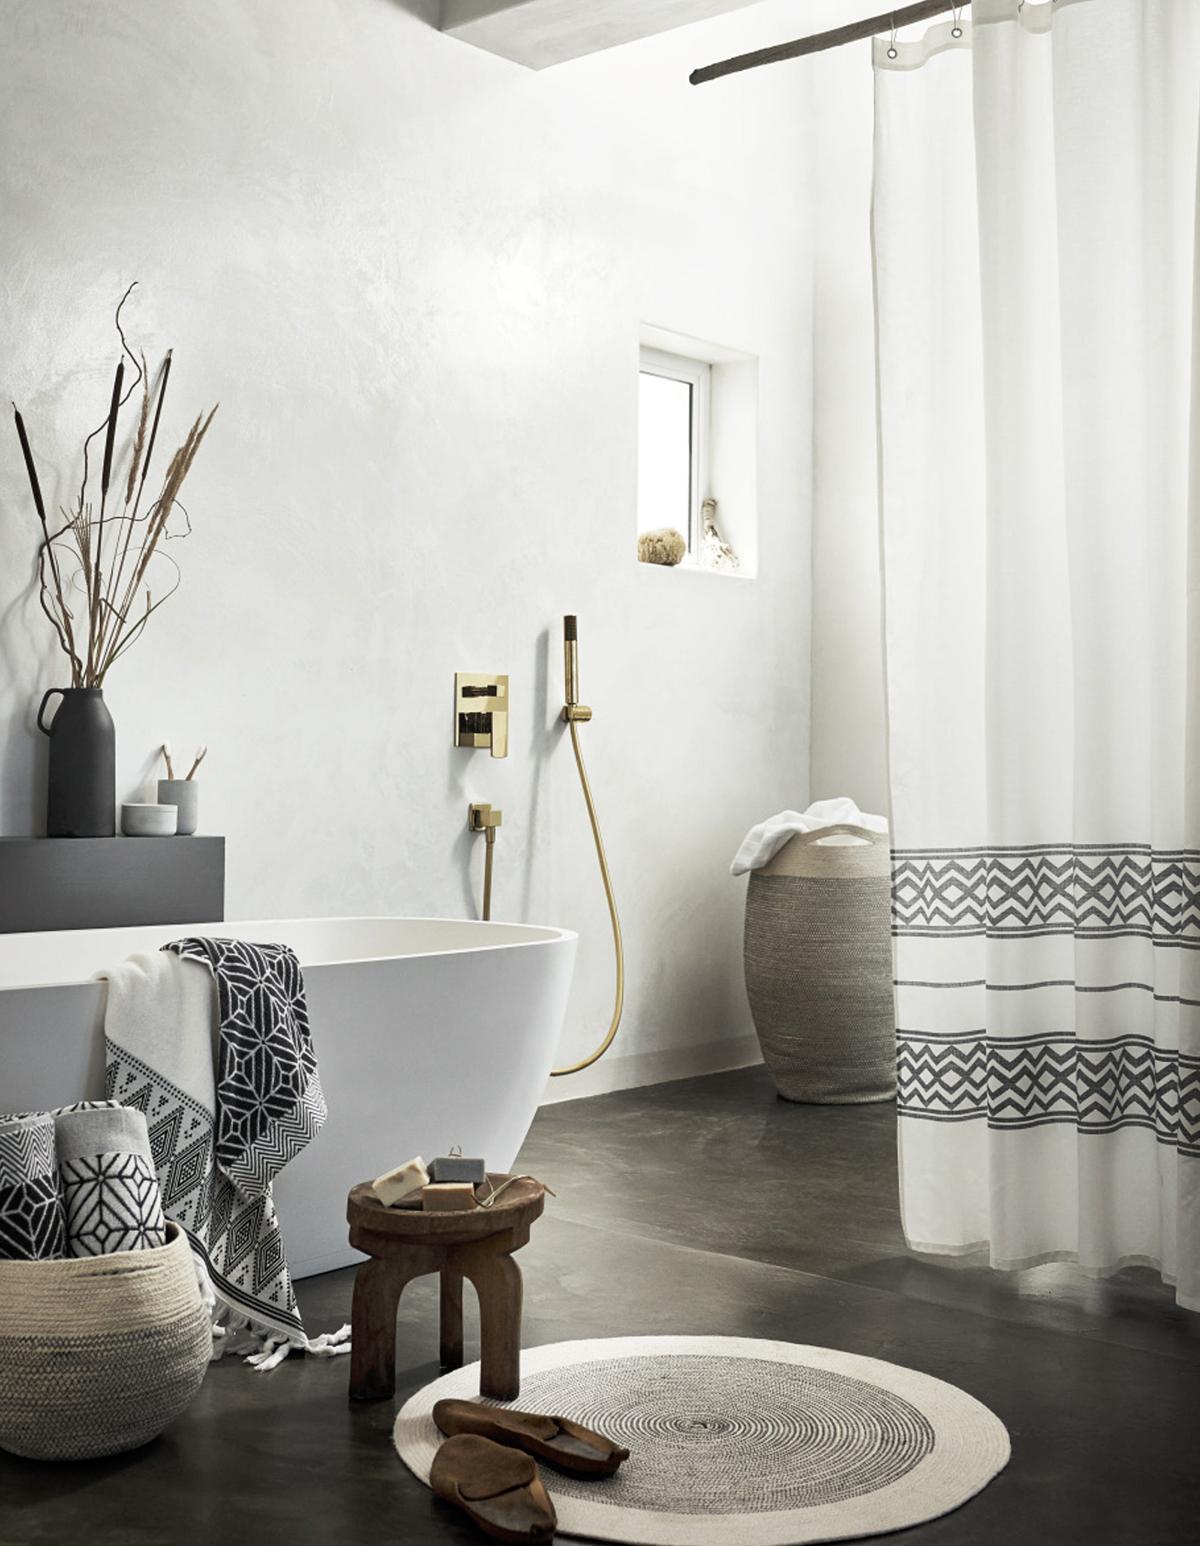 Fuite Robinet Lavabo Salle De Bain ~ Hm Home Design Beautiful Gold Accents At Hum With Hm Home Design